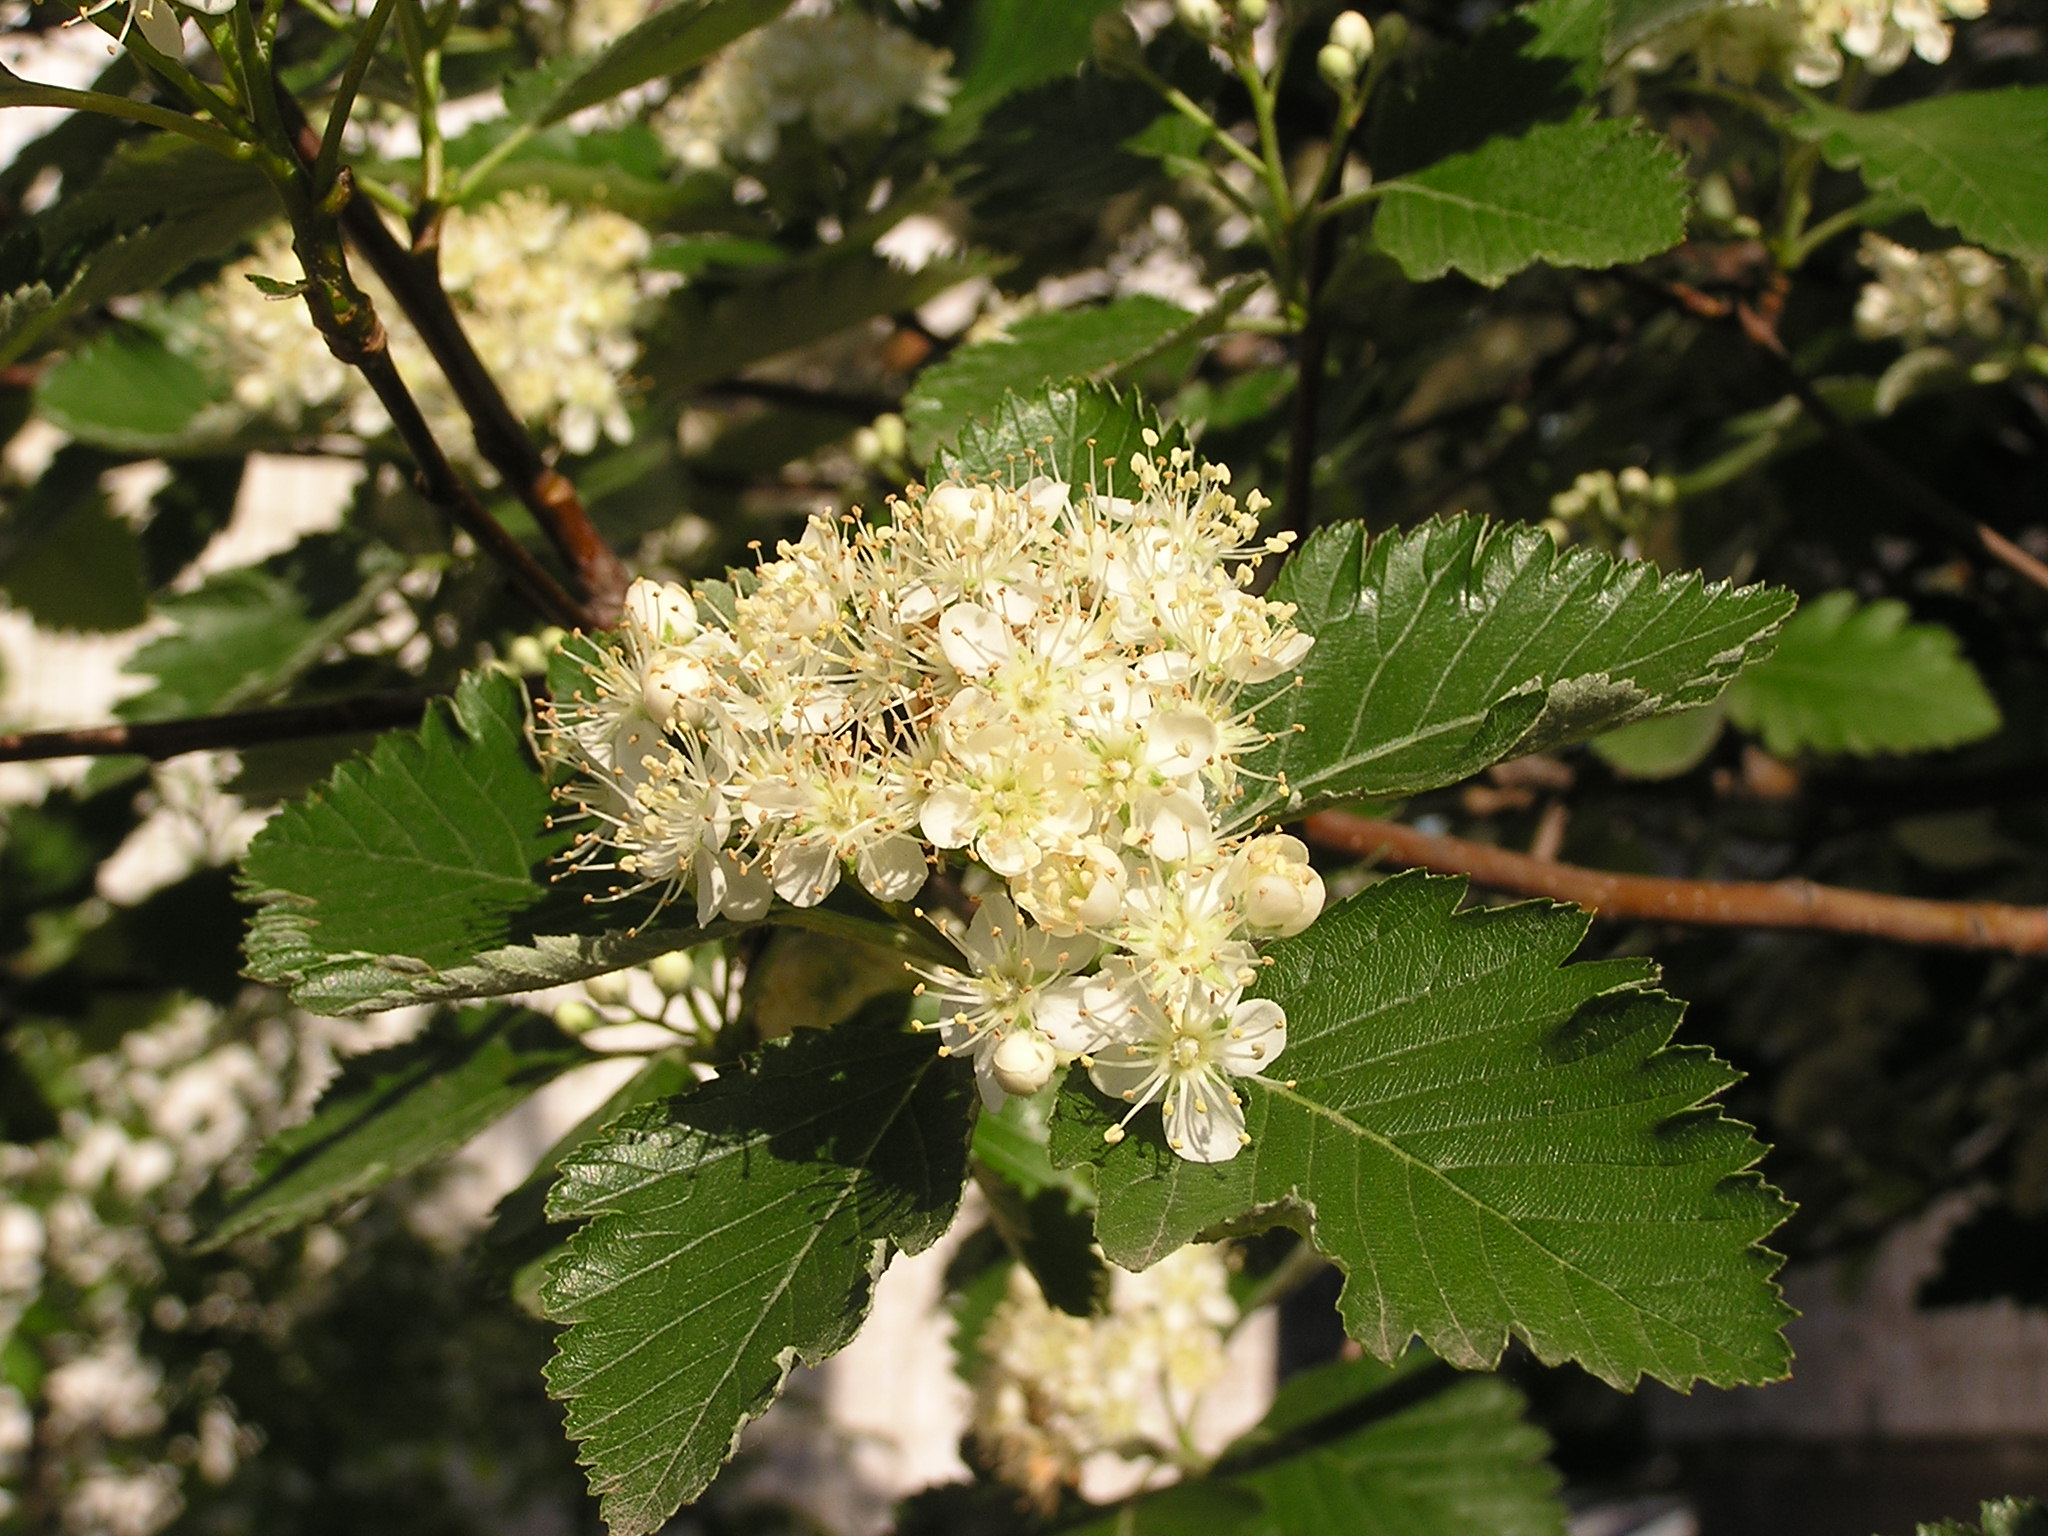 File:Sorbus mougeotii flowers.jpg - Wikimedia Commons: commons.wikimedia.org/wiki/File:Sorbus_mougeotii_flowers.jpg